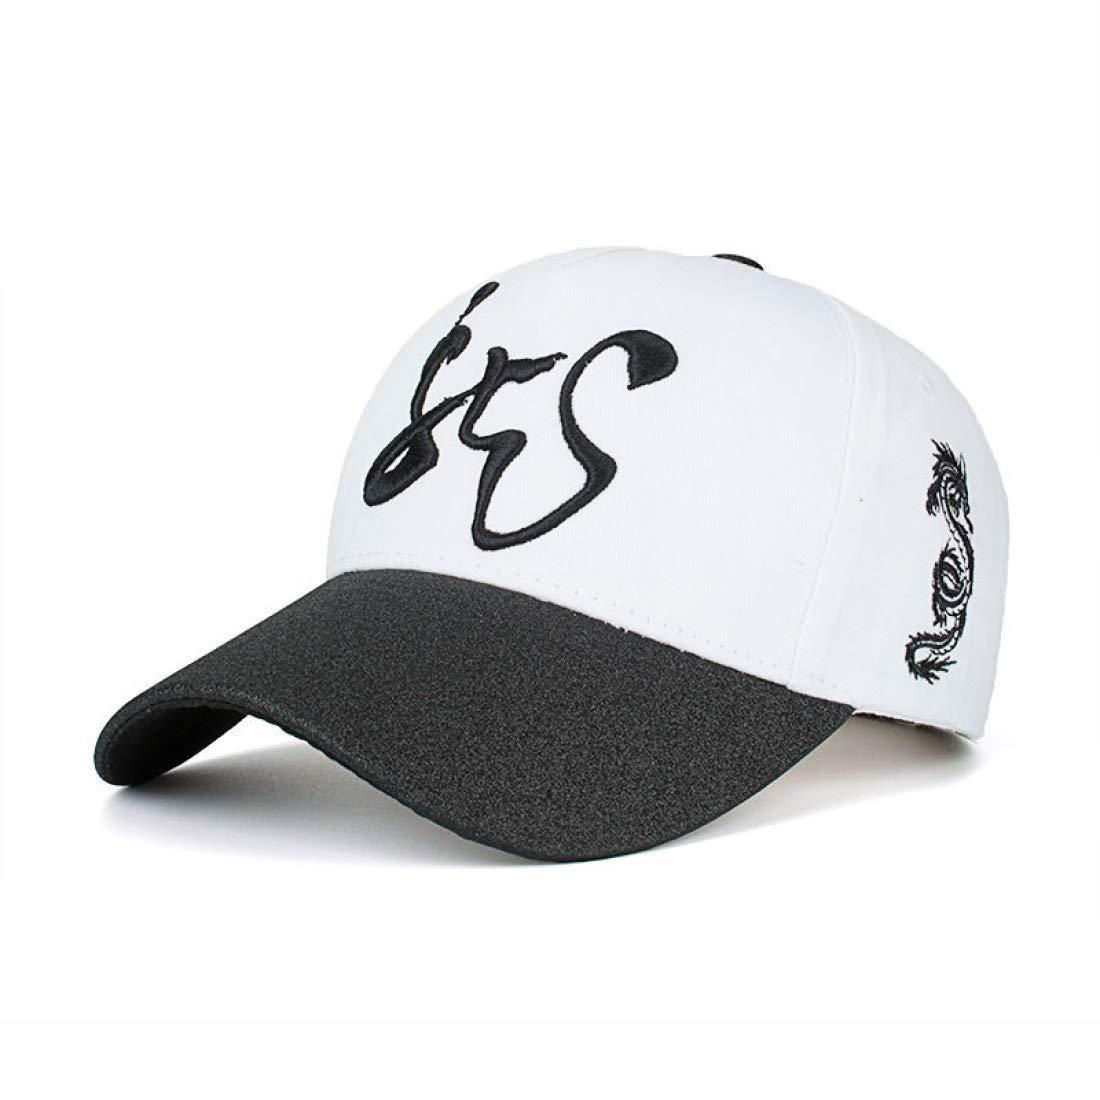 Sun Cap New Cotton Dragon-Shaped Neutral Baseball Cap Outdoor Sunshade Cap B456 Hat Duck Tongue Cap